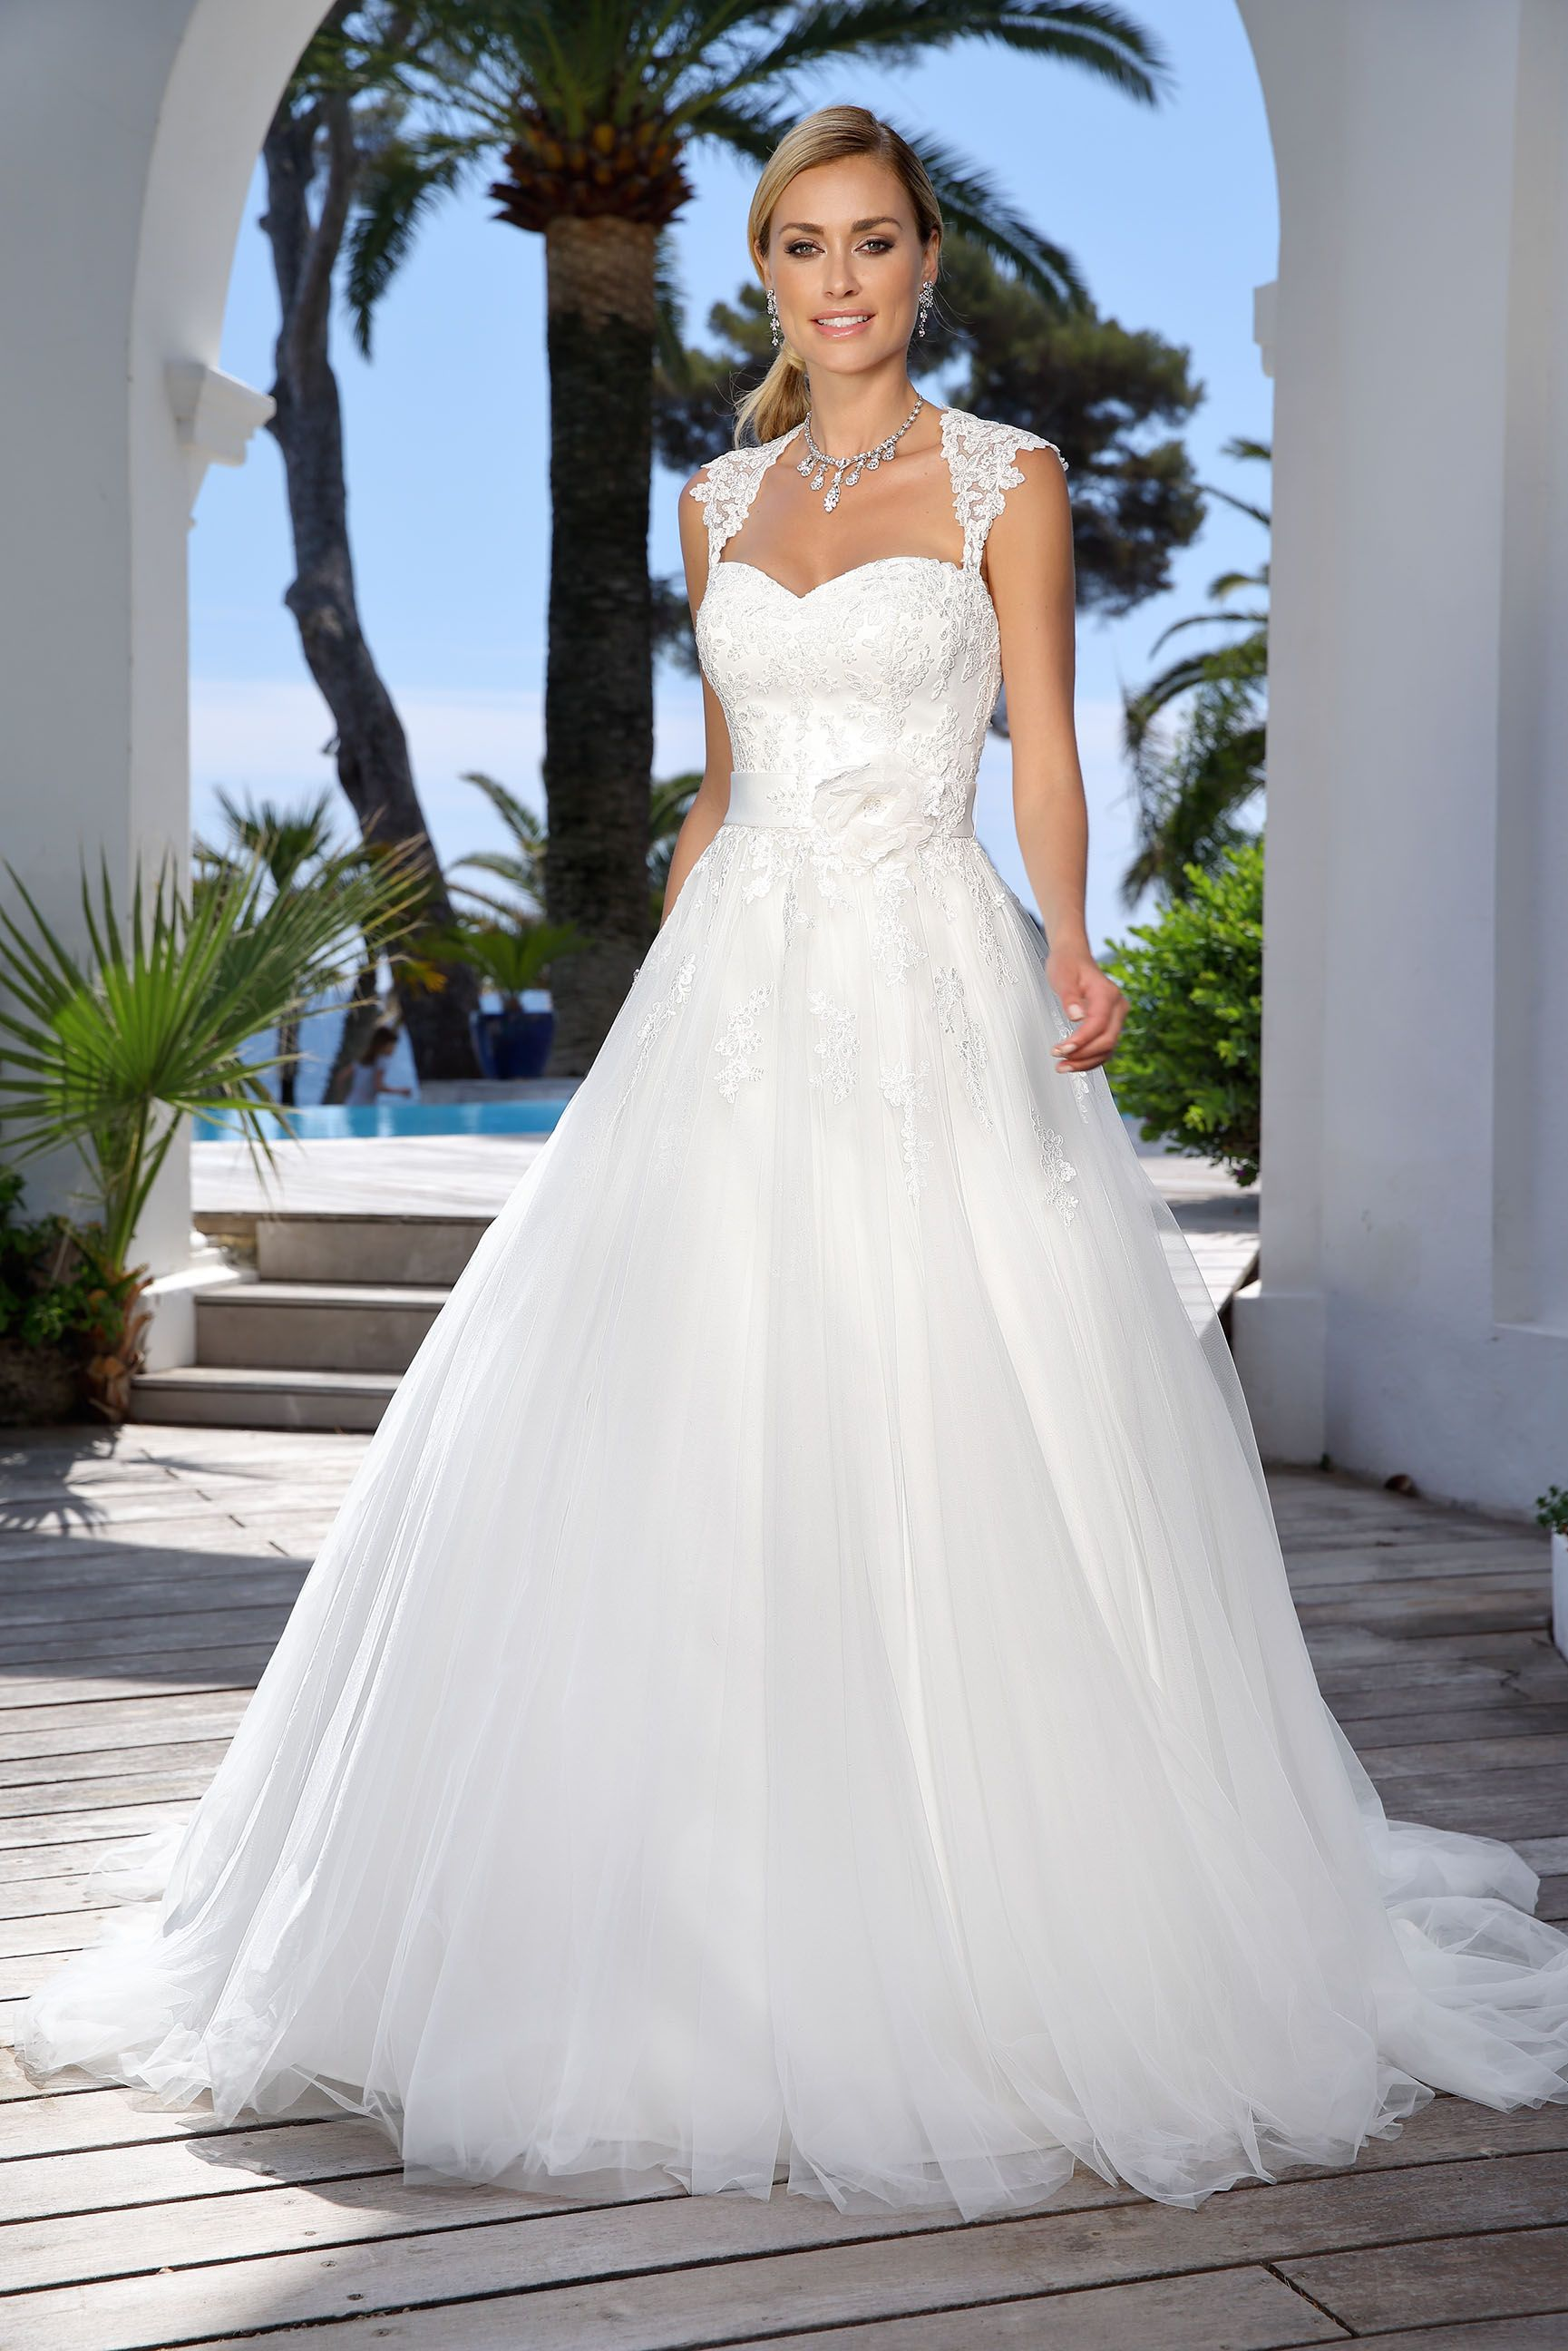 Ladybird Wedding Dress 416003 | Ladybird Collection 2016 | Pinterest ...